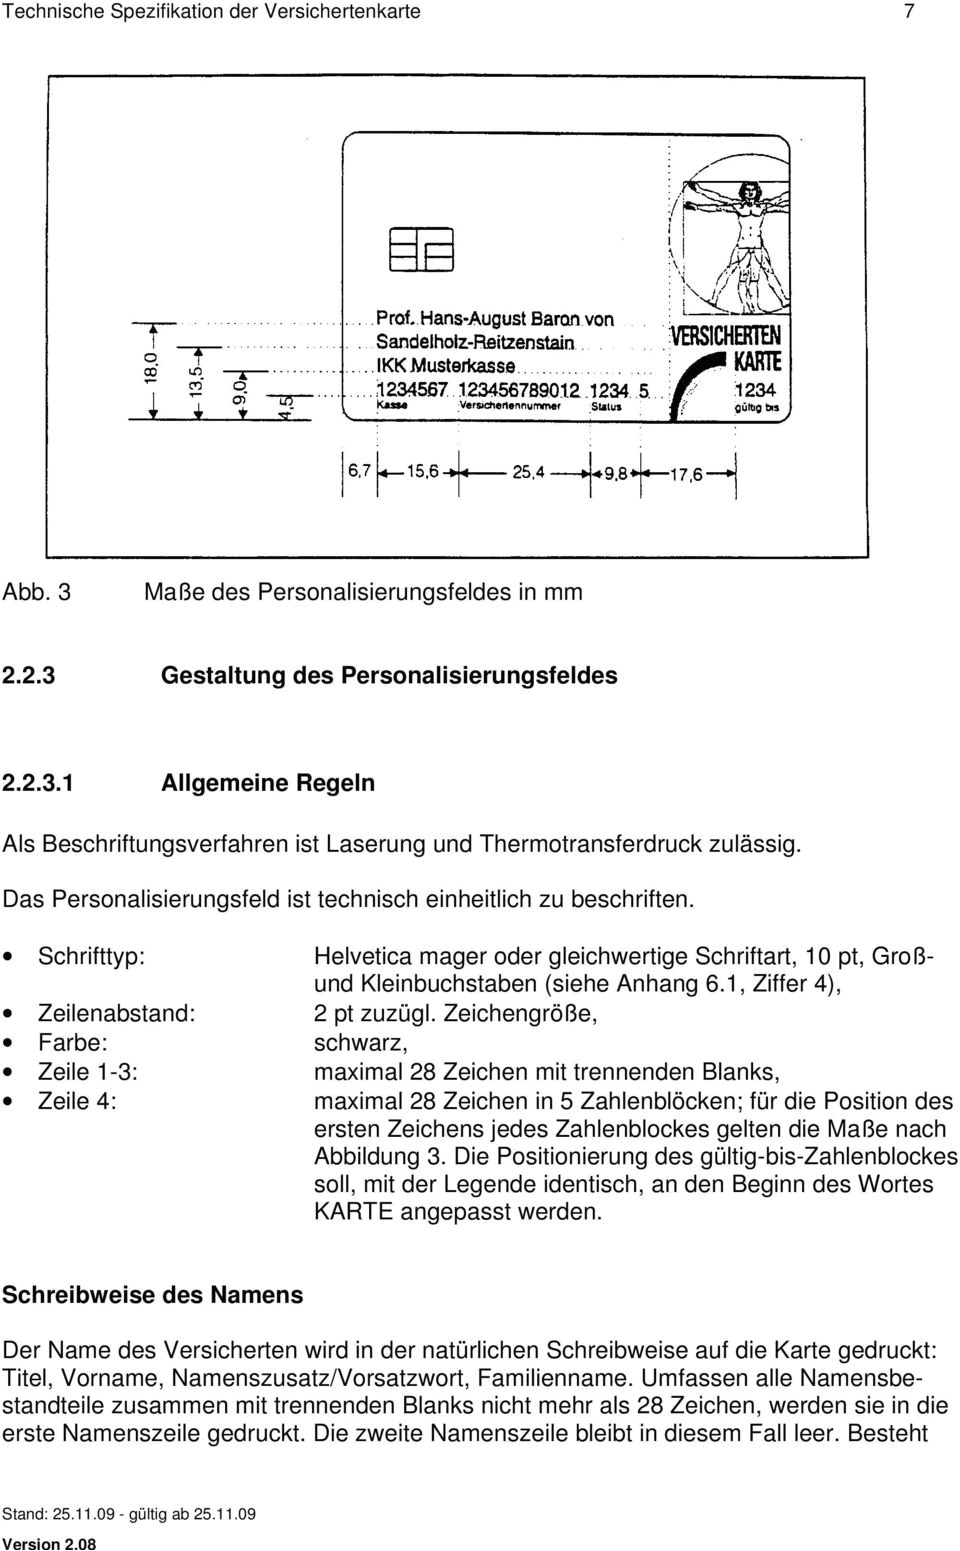 page 7 jpg